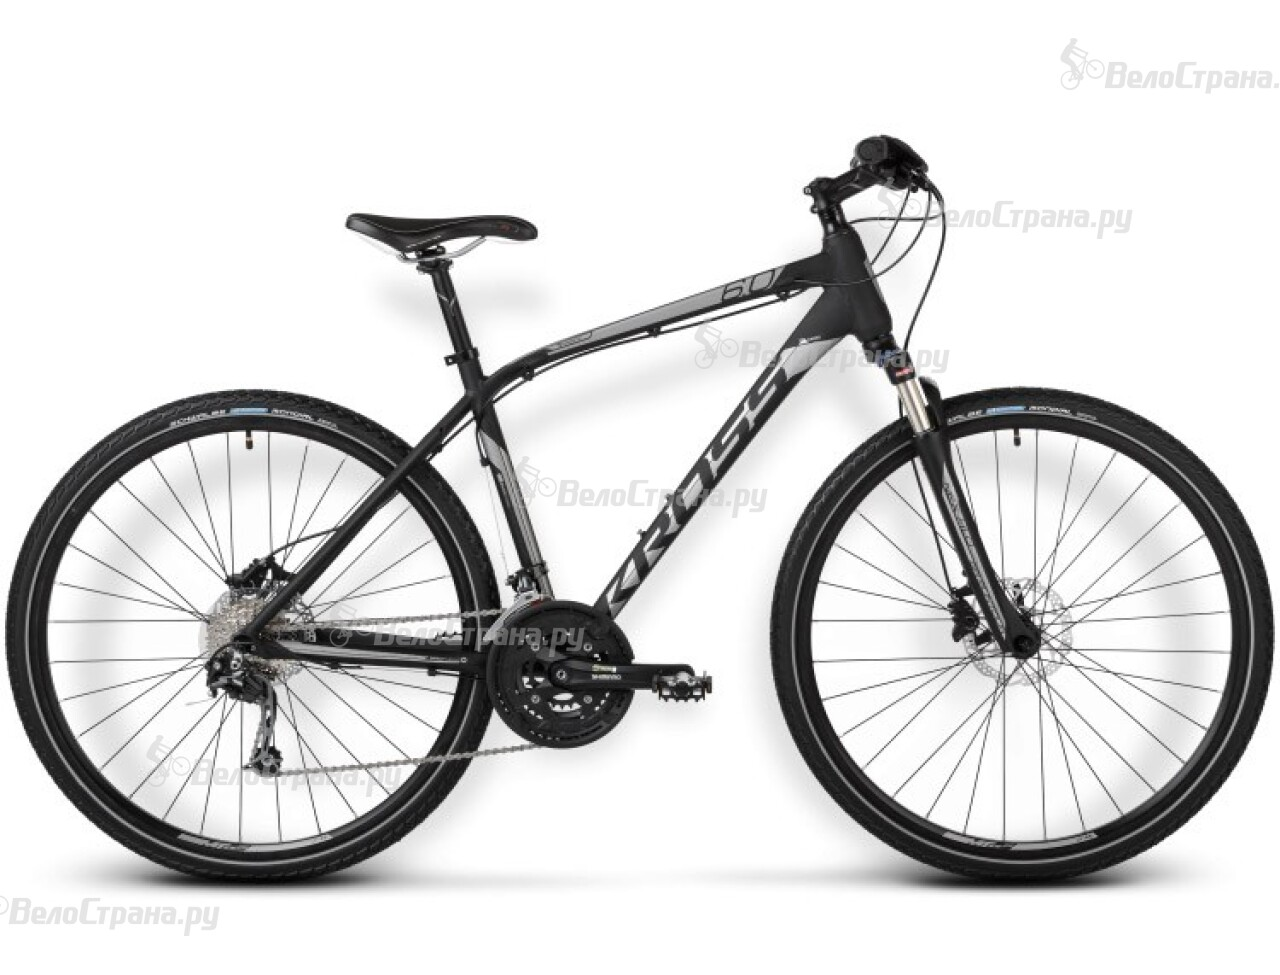 Фото Велосипед Kross Evado 6.0 (2015) 2015 csm360